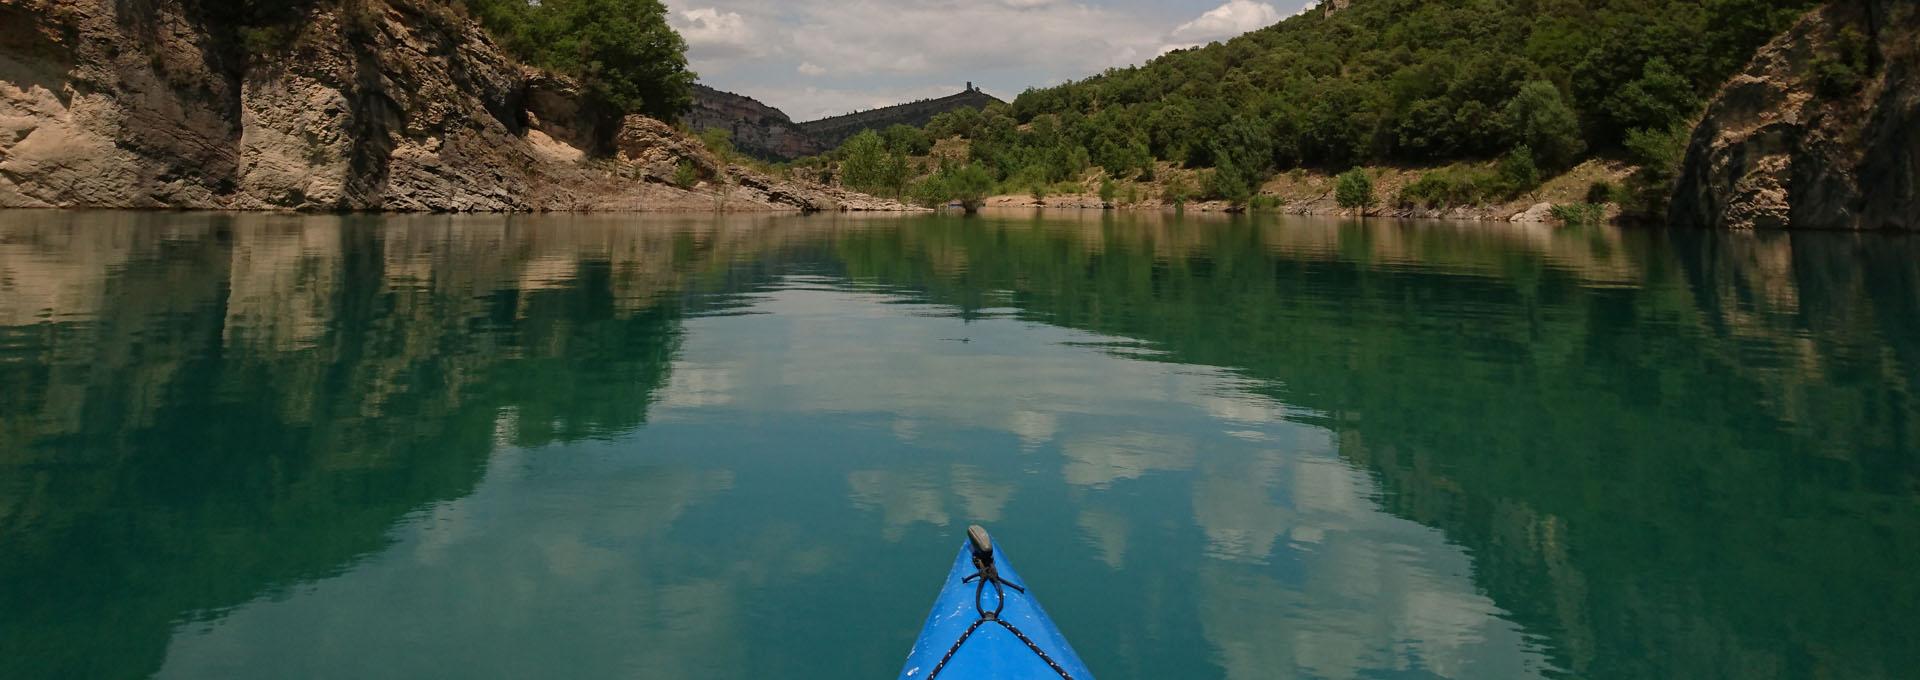 Inicial Intrepid Kayaks